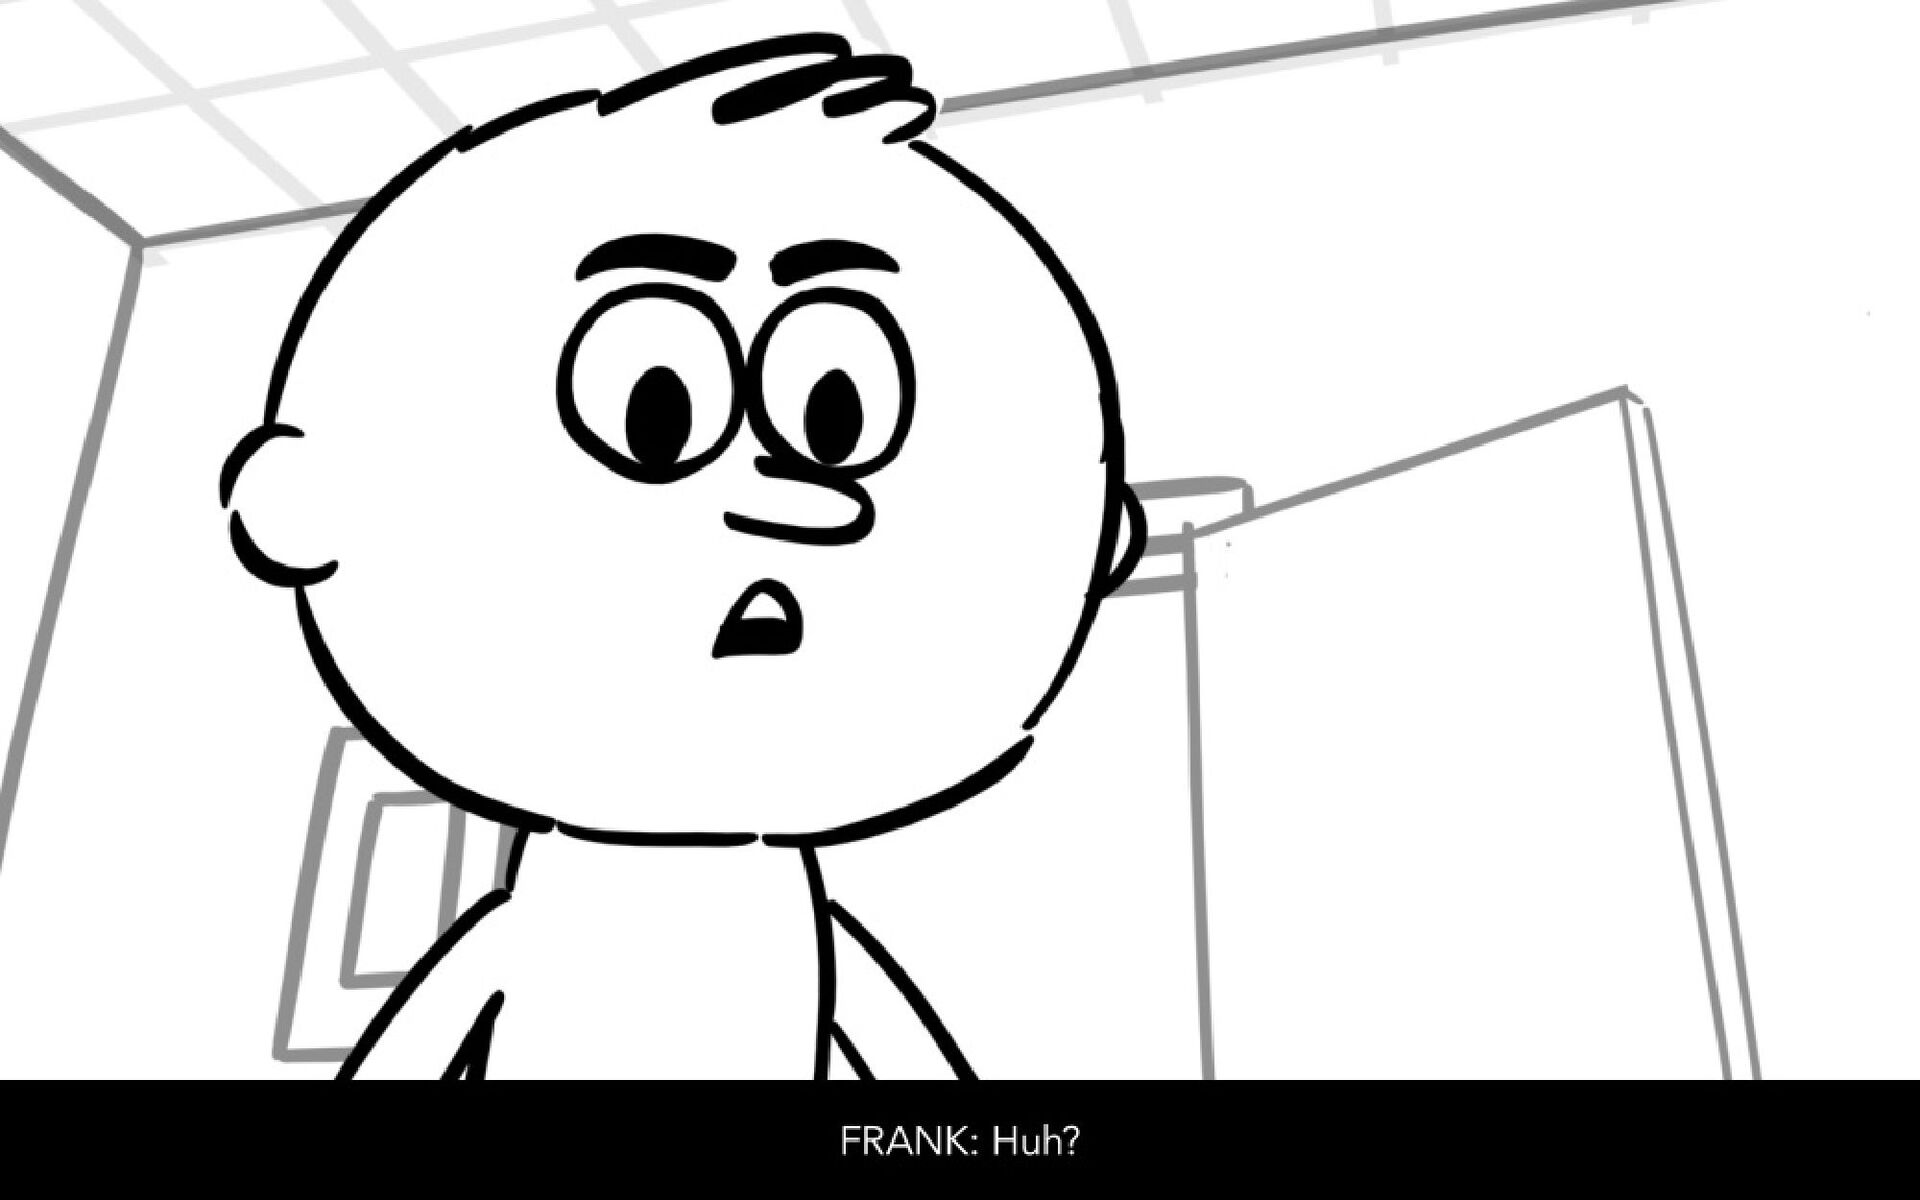 Dialog FRANK: Huh?